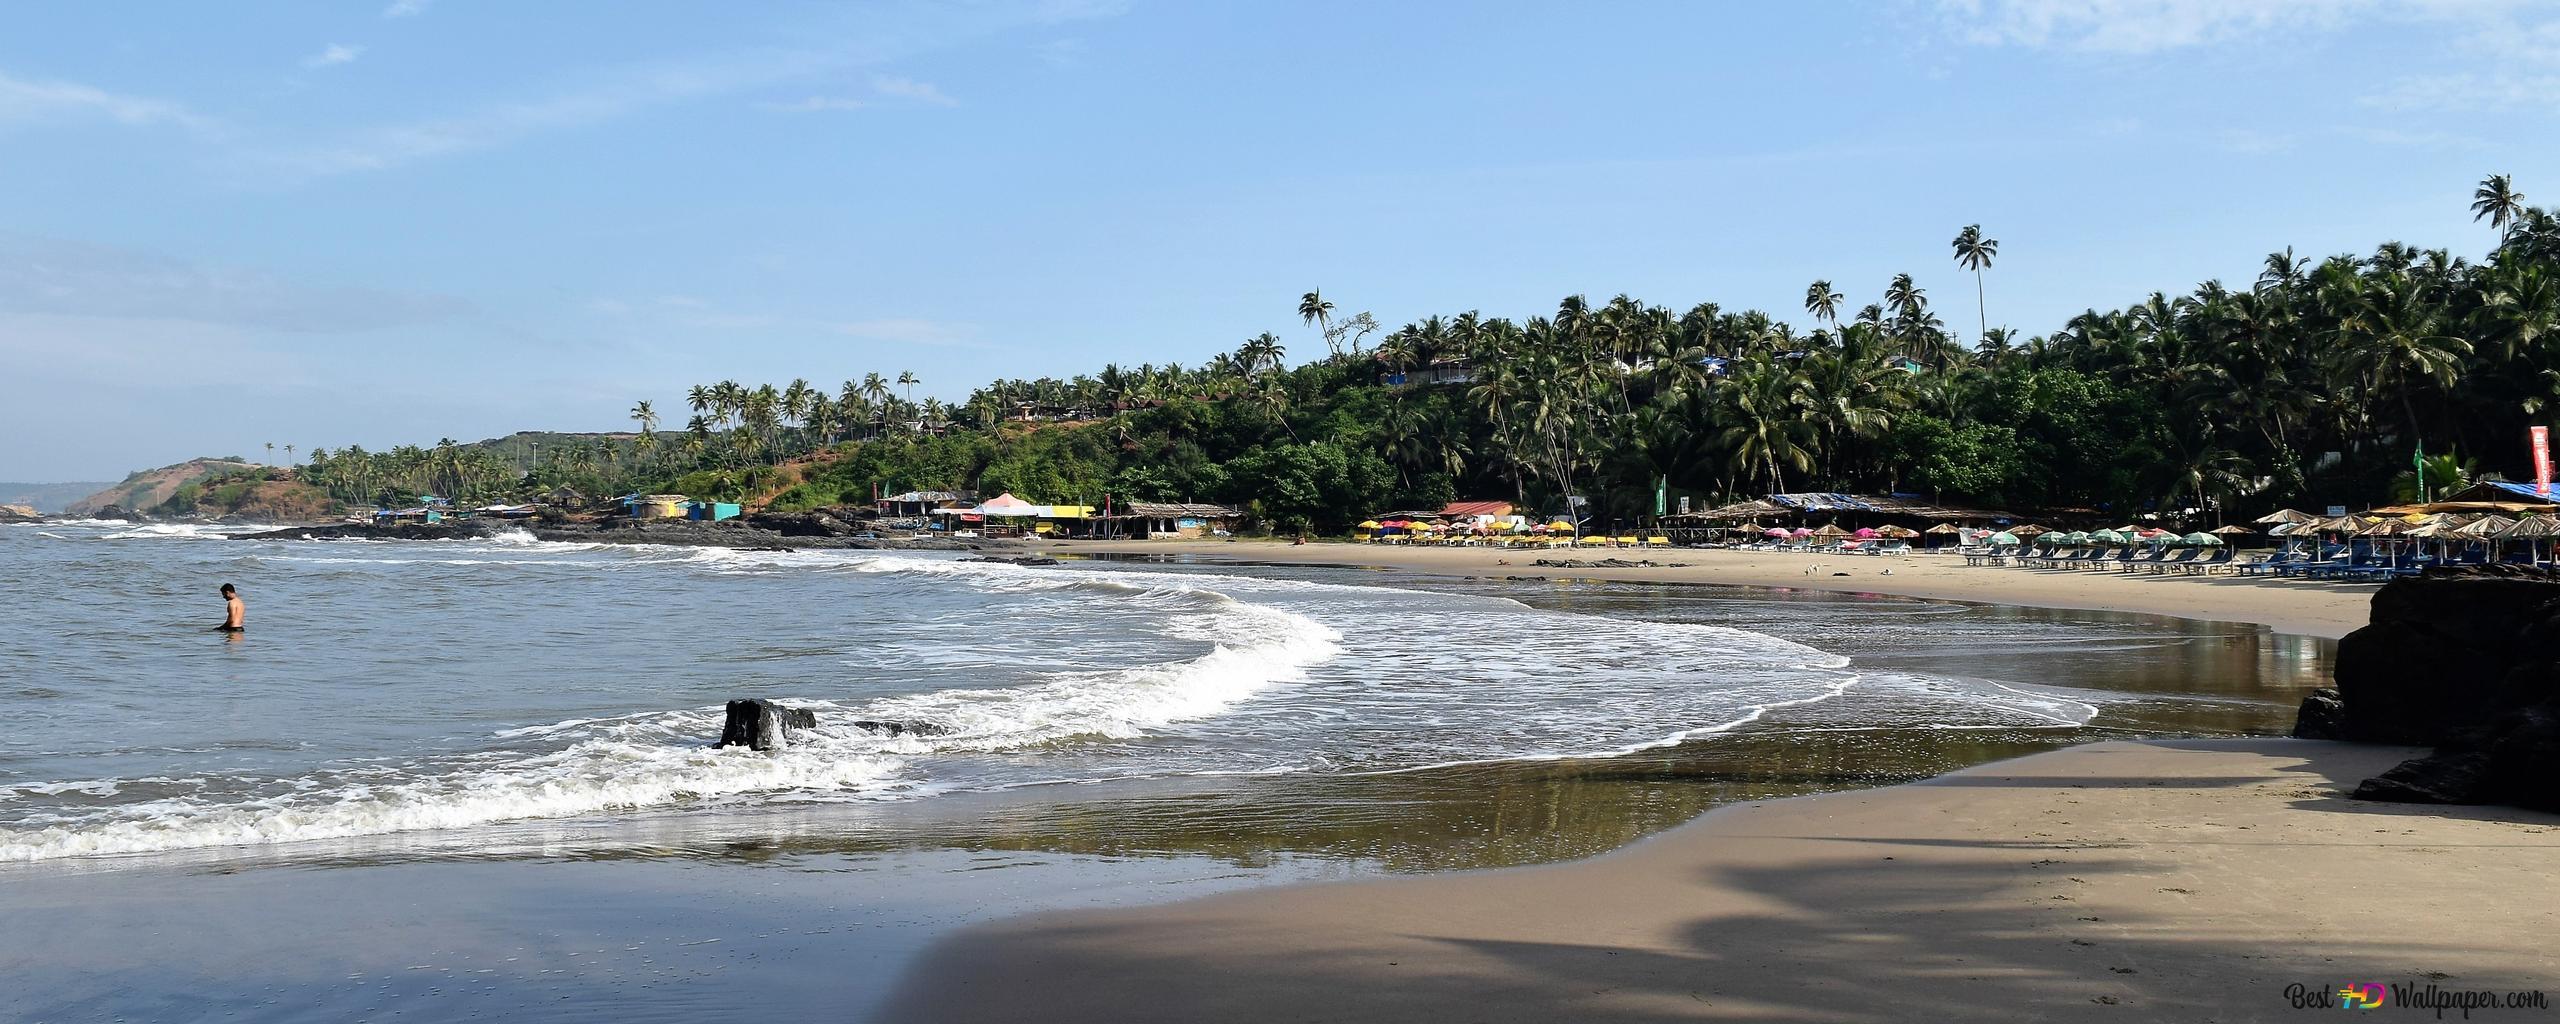 Goa Beach Parallax Hd Iphone Ipad Wallpaper: North Goa HD Wallpaper Download